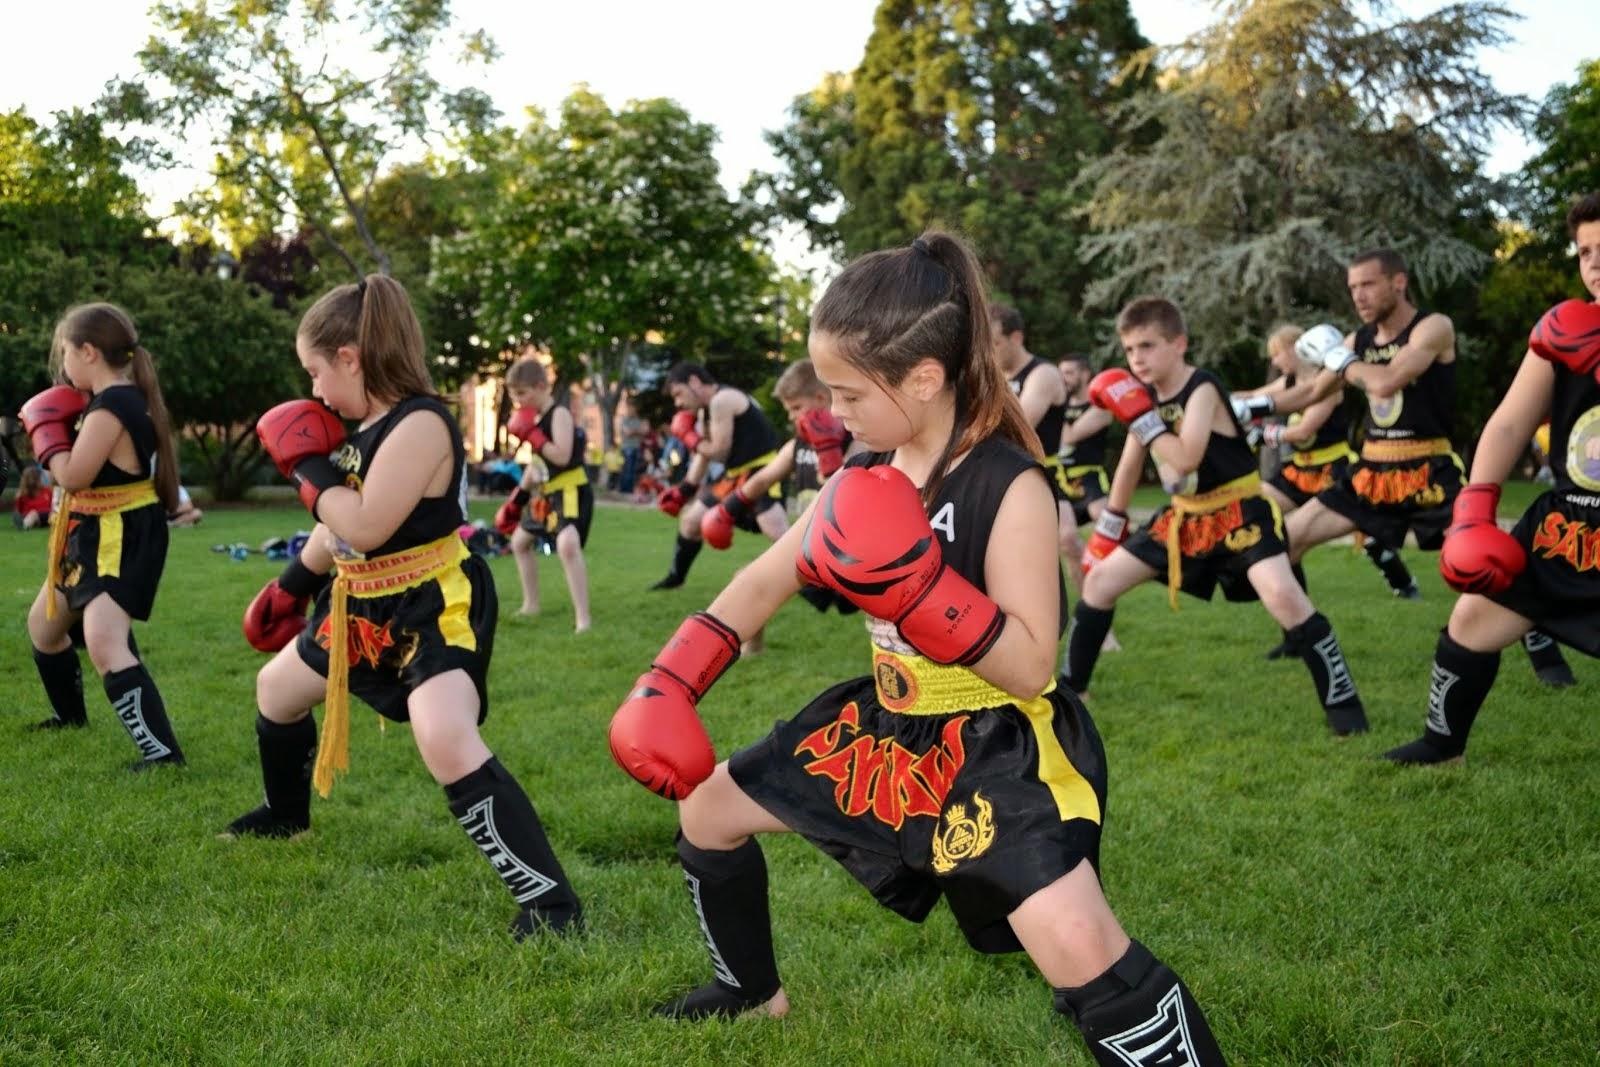 boxe chines Infantil - mestre senna